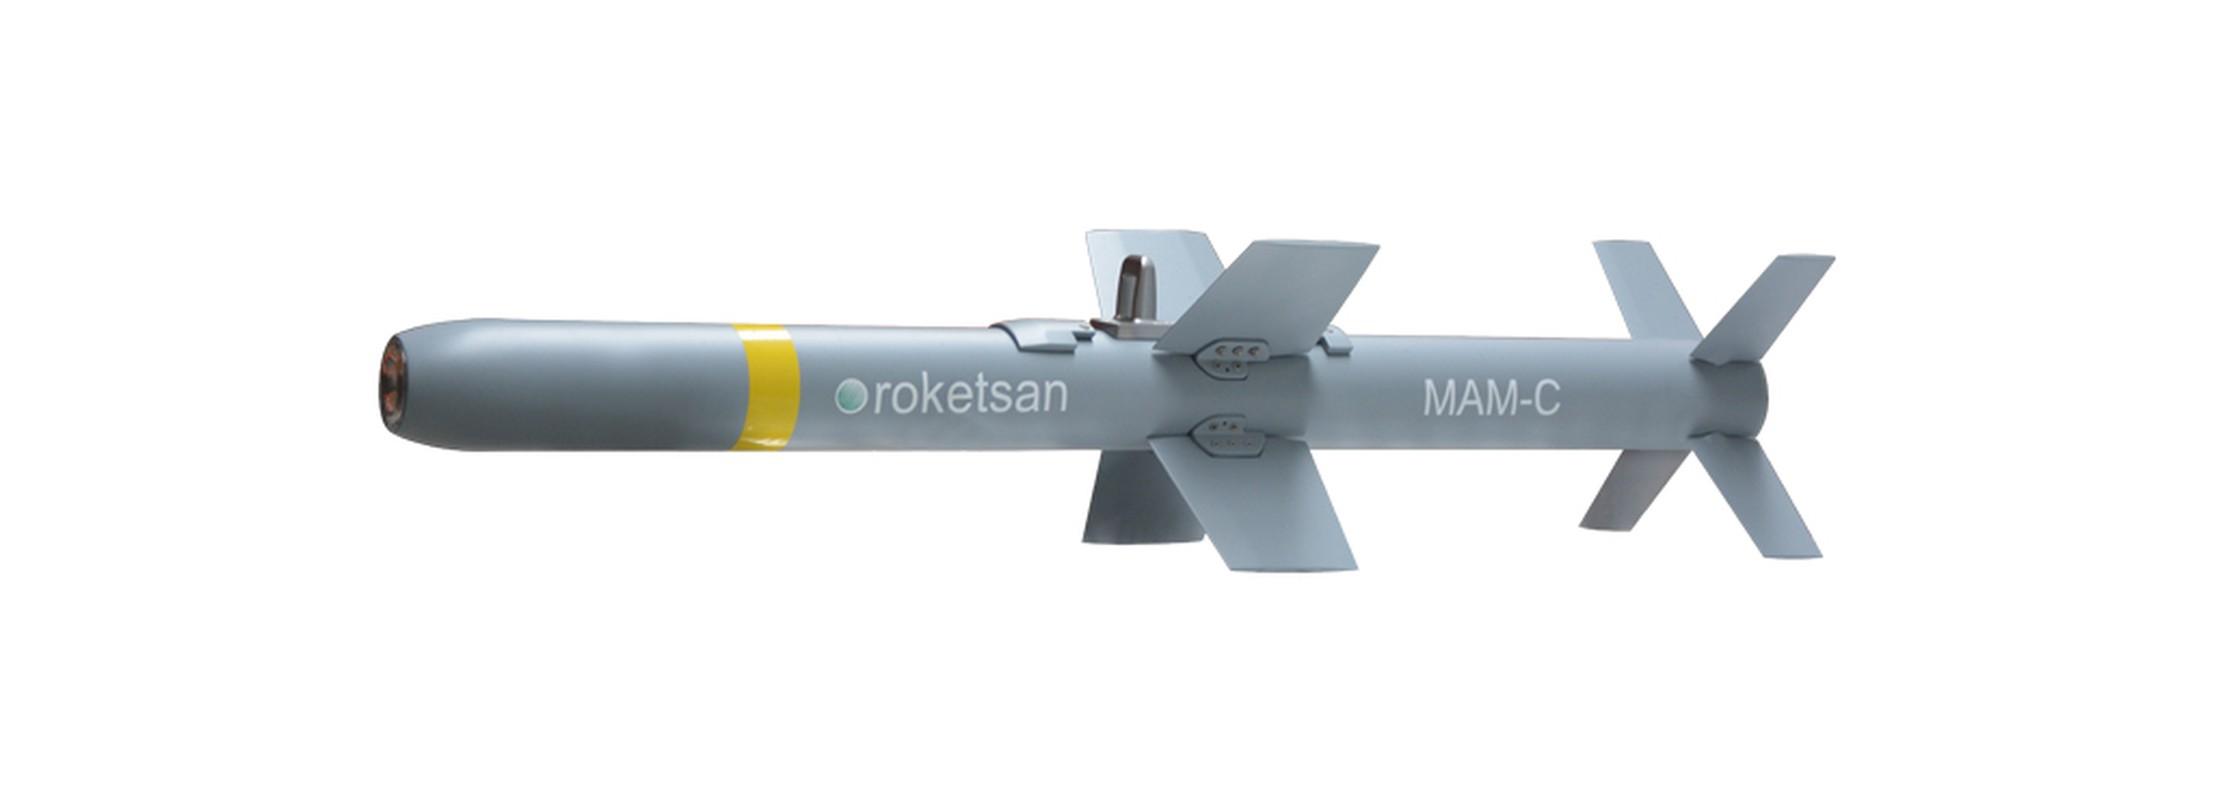 Vuot mat Israel, Tho Nhi Ky tro thanh sieu cuong UAV tiep theo-Hinh-12